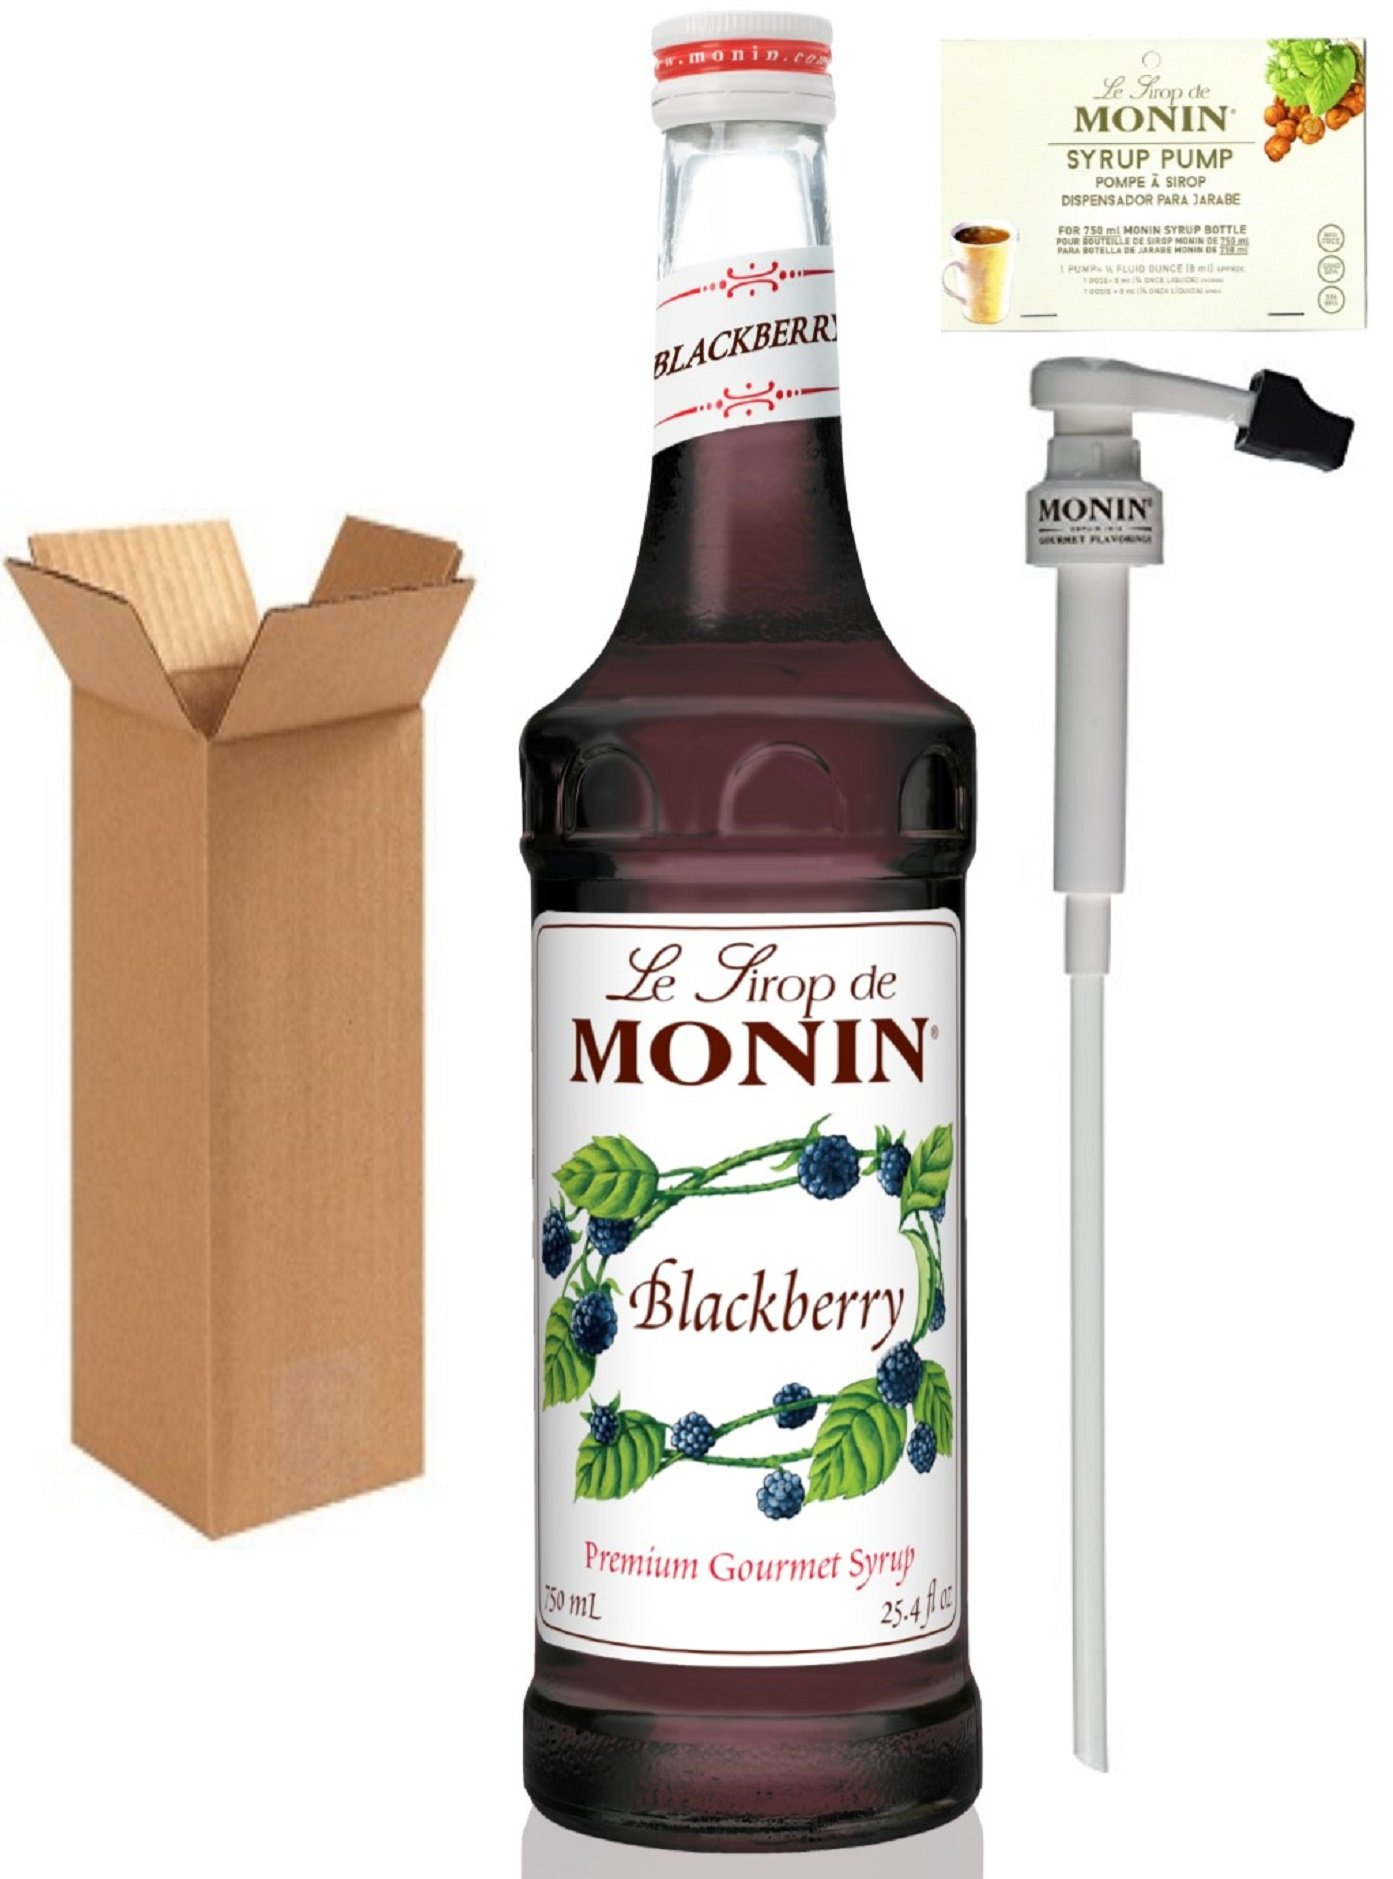 Monin Blackberry Syrup, 25.4-Ounce (750 ml) Glass Bottle with Monin BPA